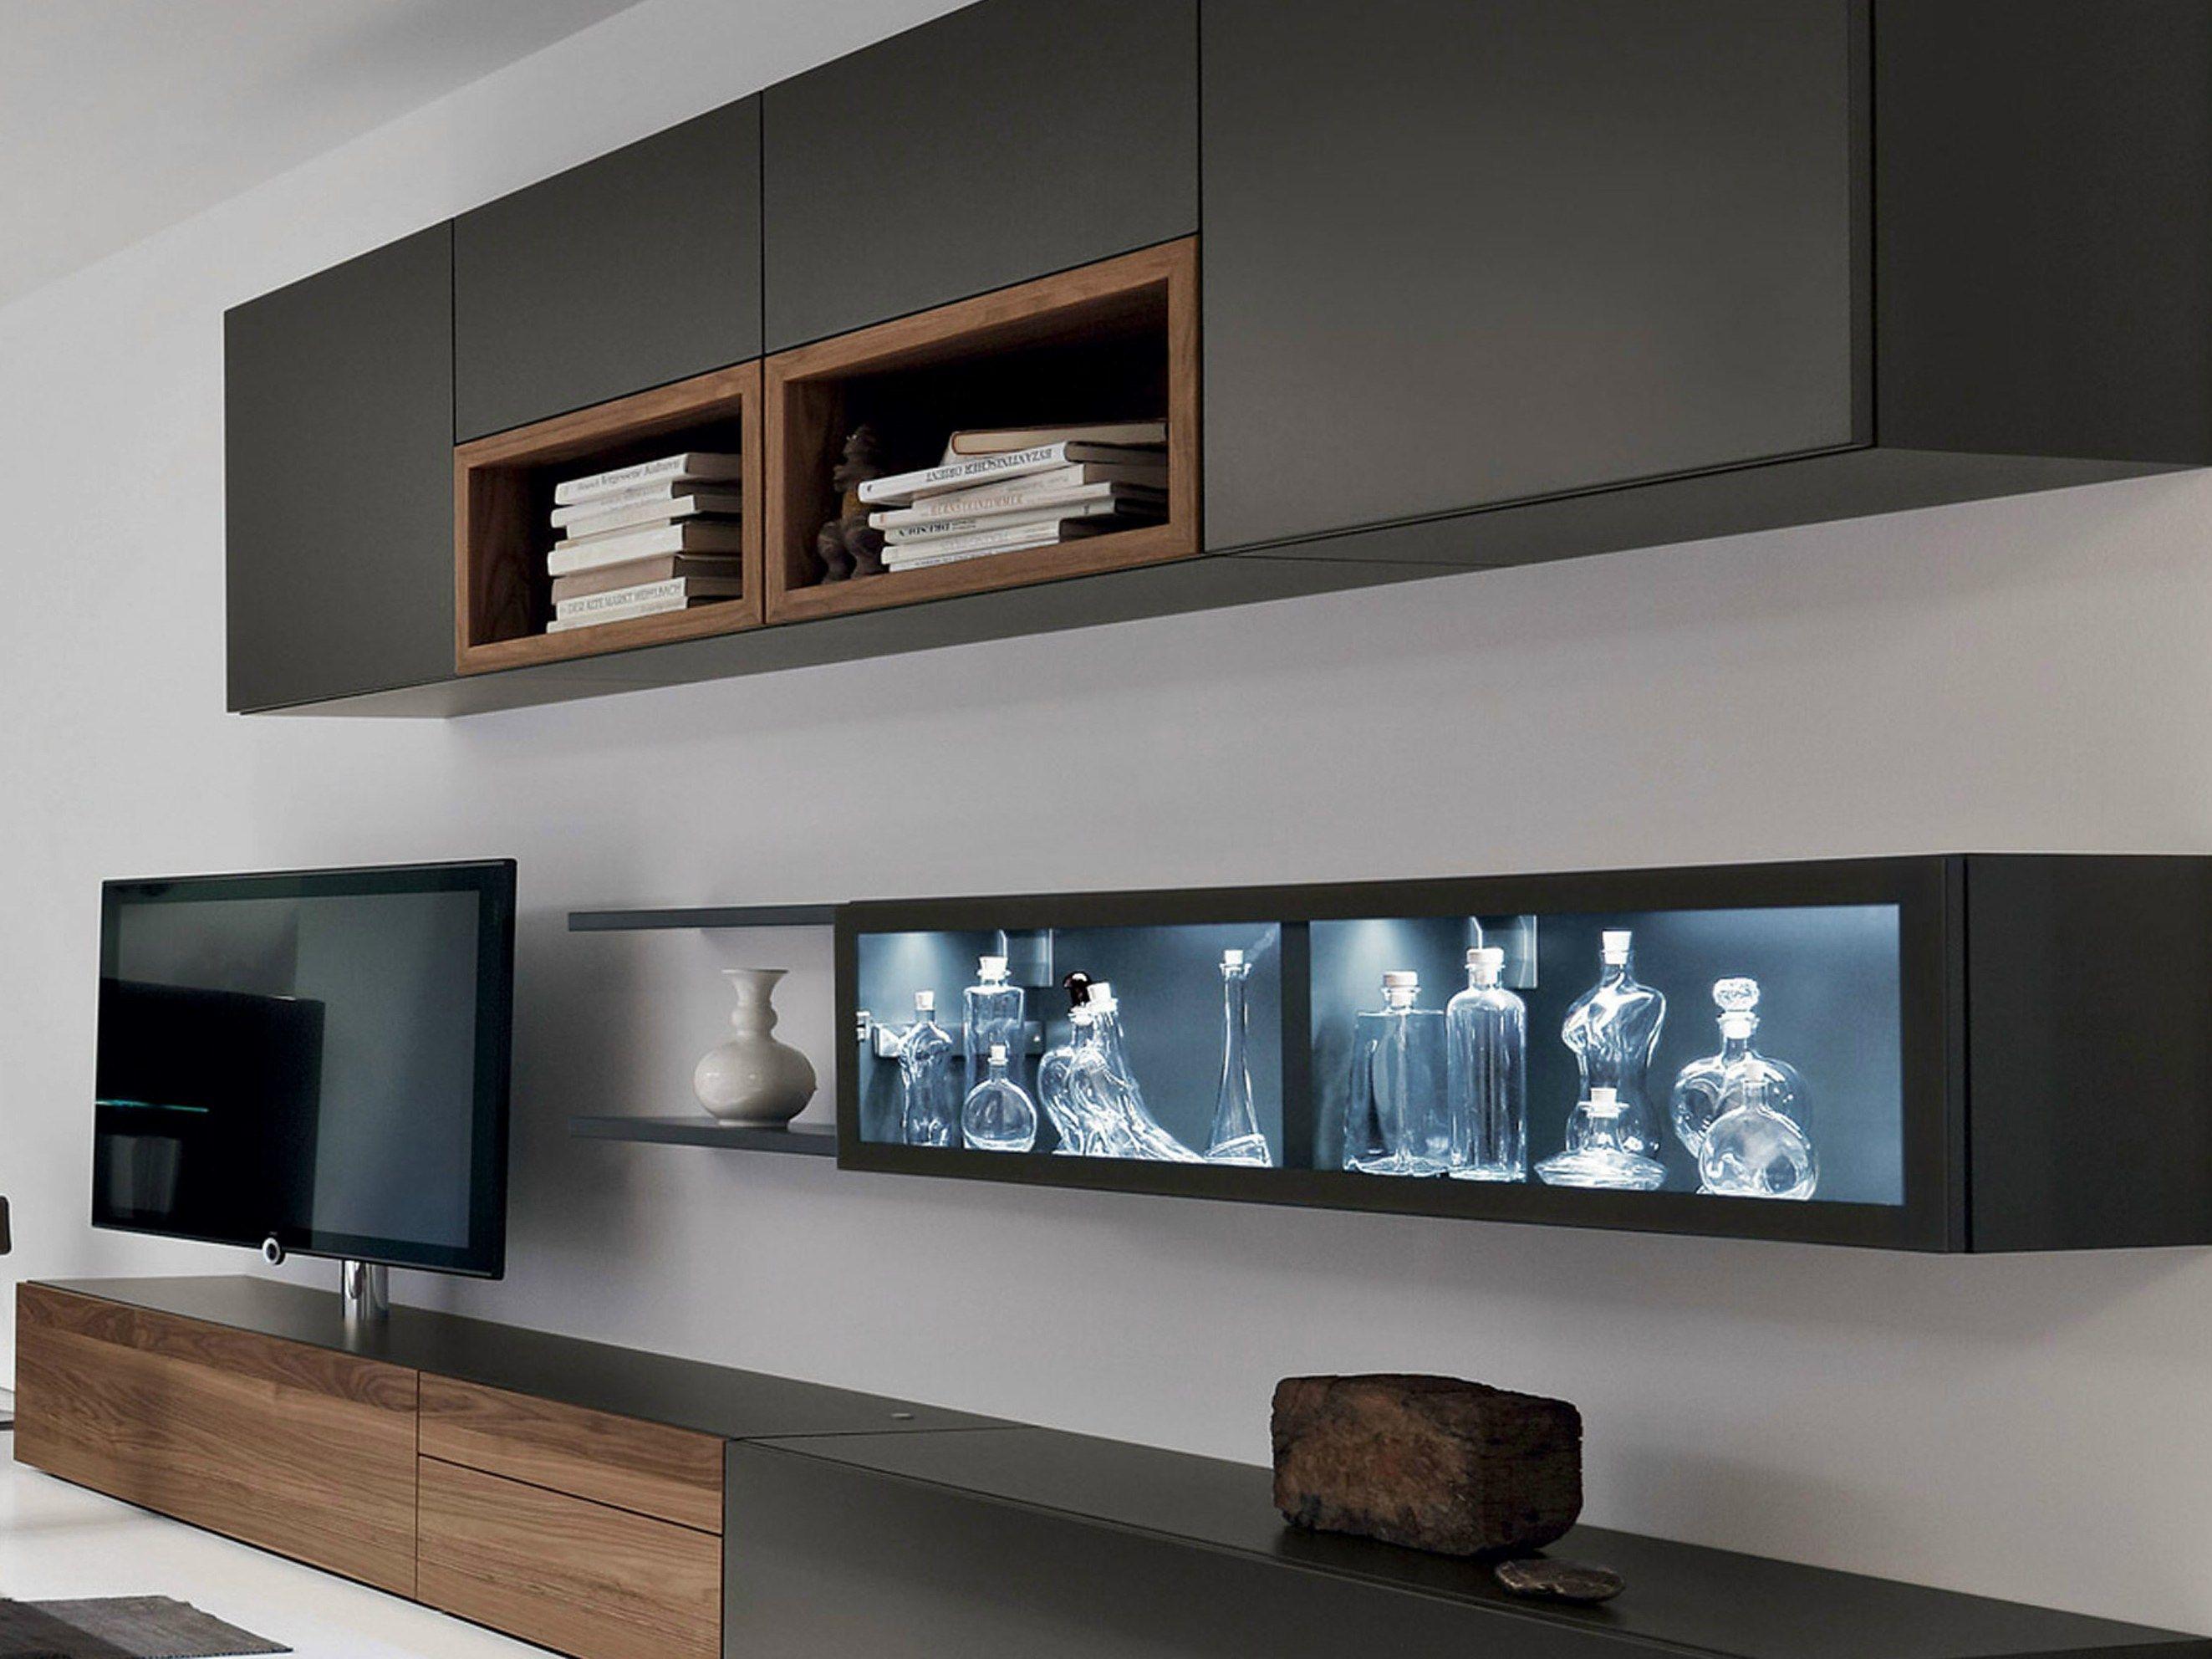 NEO TV- Wohnwand by Hülsta-Werke Hüls